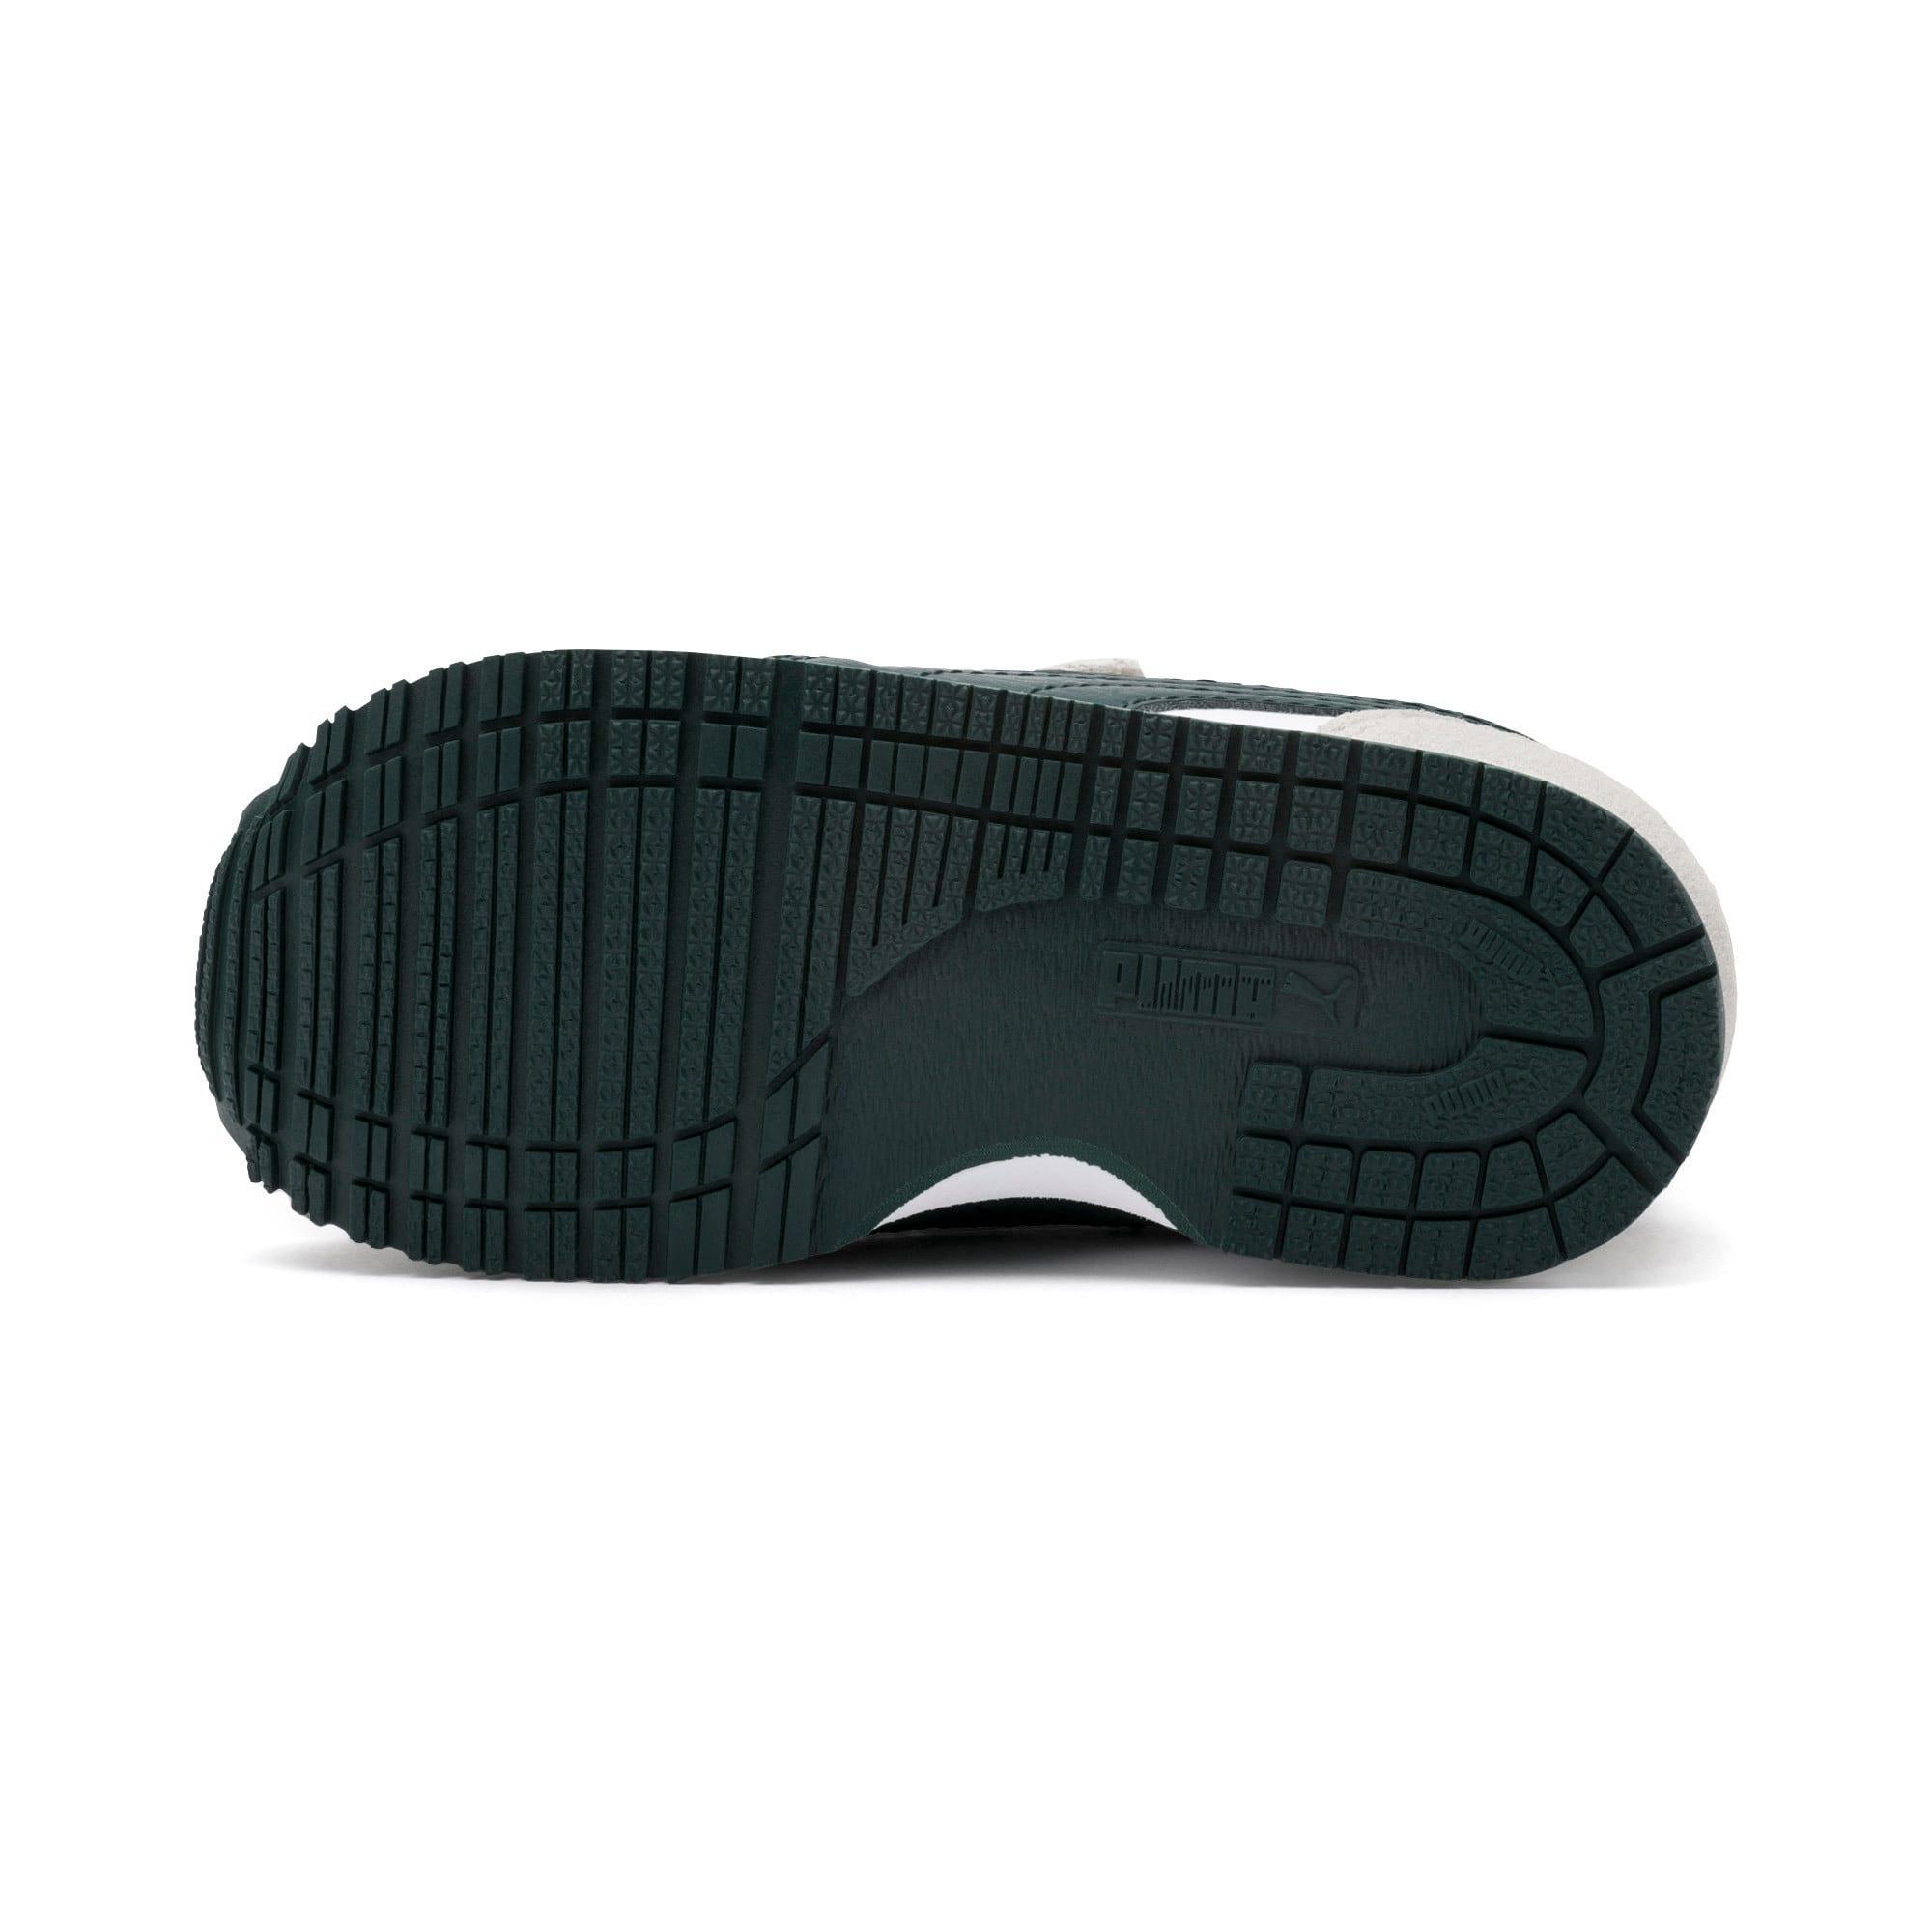 Thumbnail 3 of Cabana Racer SL AC Little Kids' Shoes, P.Wht-Gr.Violet-Ponder. Pine, medium